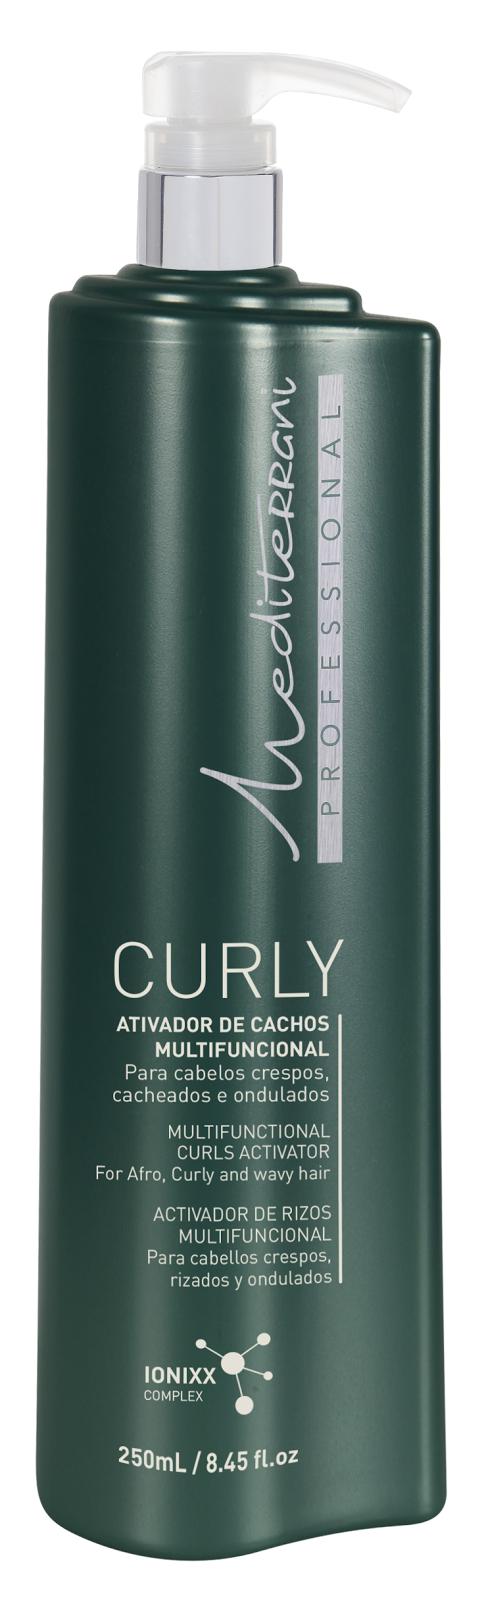 Curly - Mediterrani 250mL - belanaselfie